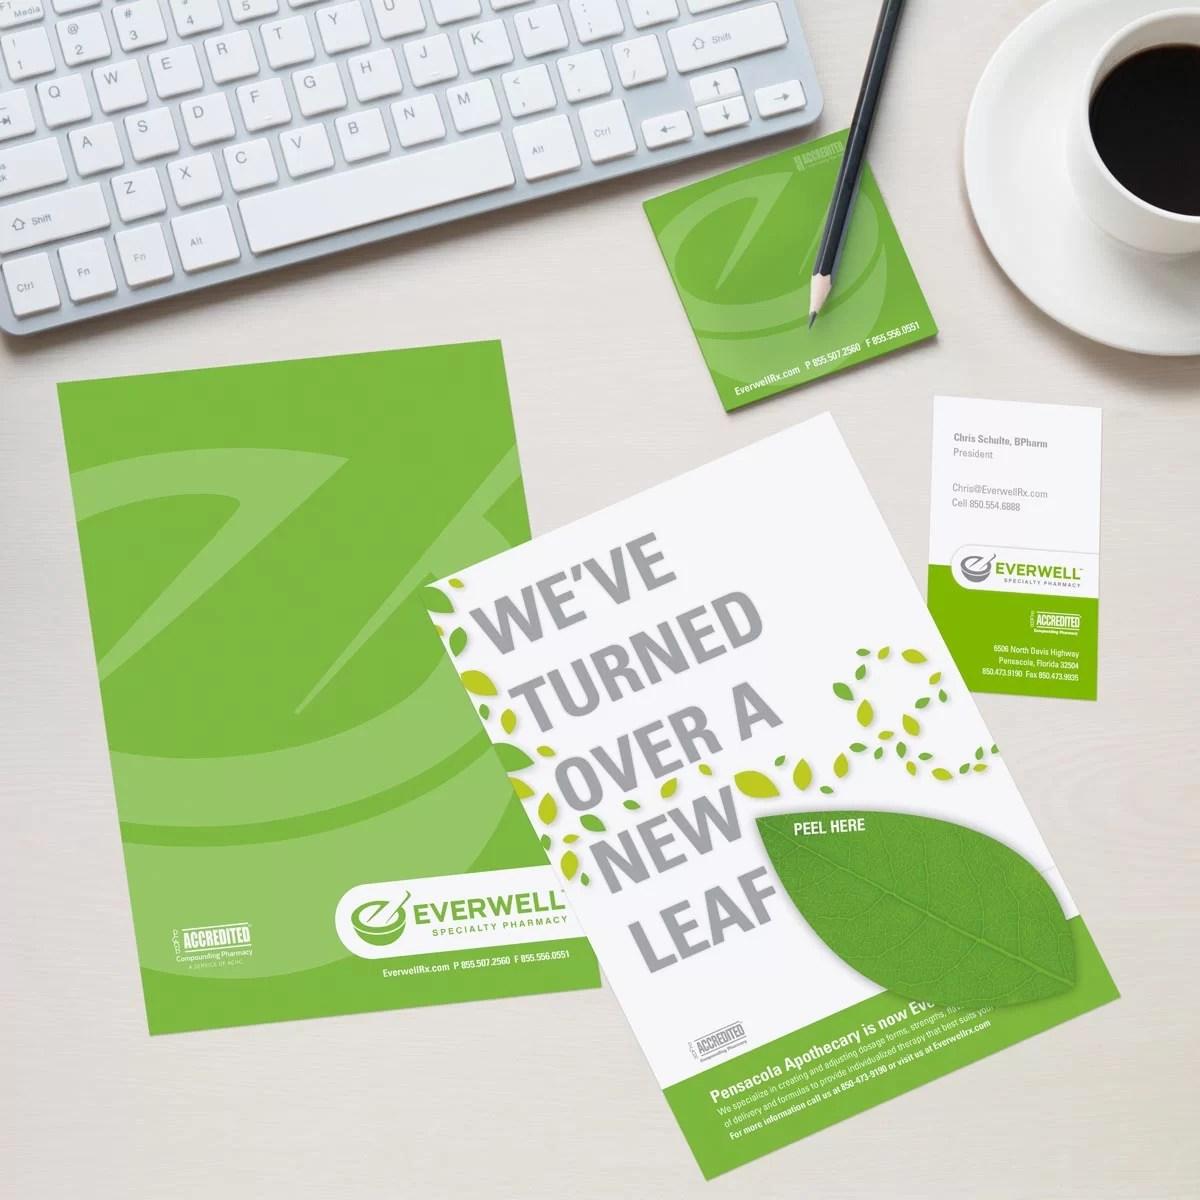 Everwell Rebranding, Lucid Advertising